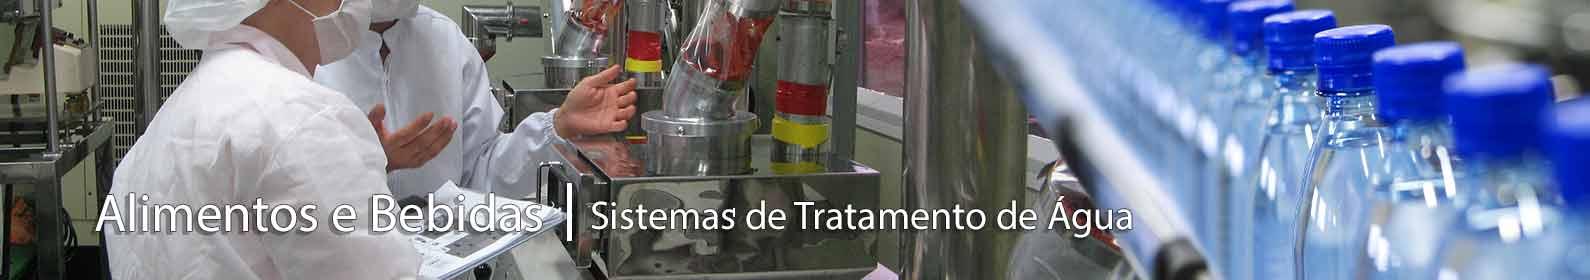 sistema-de-tratamento-de-gua-alimentos-e-bebidas.jpg